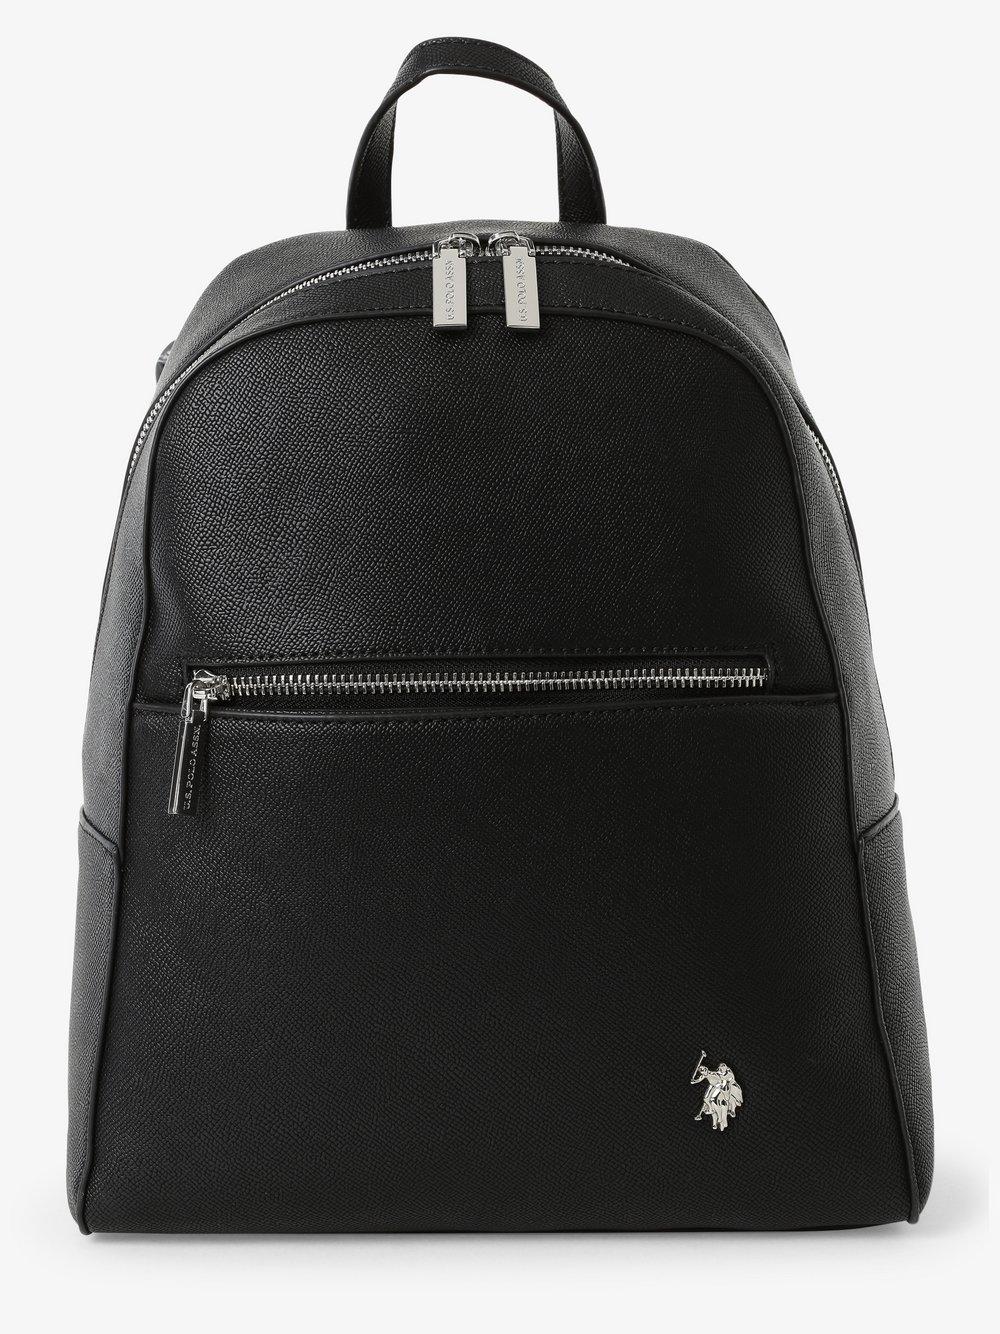 U.S. Polo Assn. – Plecak damski – Jones, czarny Van Graaf 485258-0001-00000